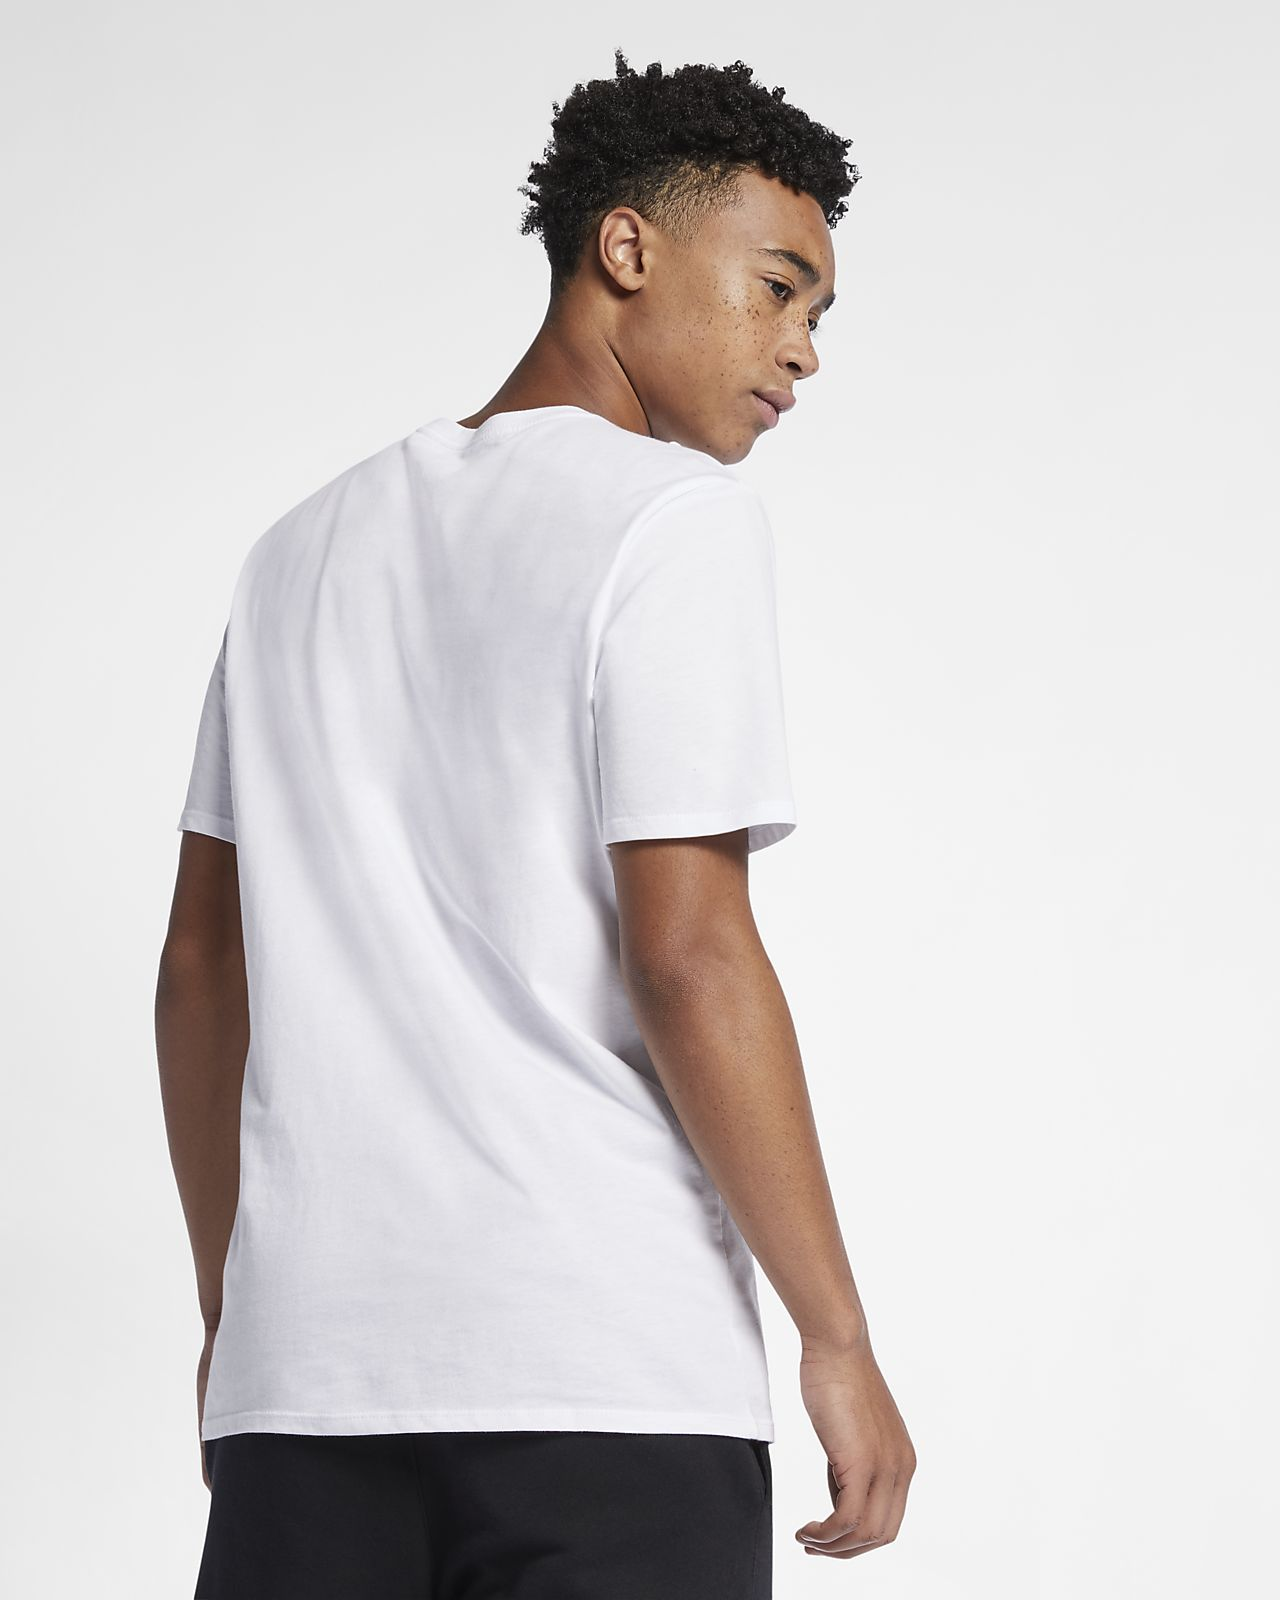 fc278c2d08e6 Low Resolution Pánské tričko Nike Sportswear Pánské tričko Nike Sportswear